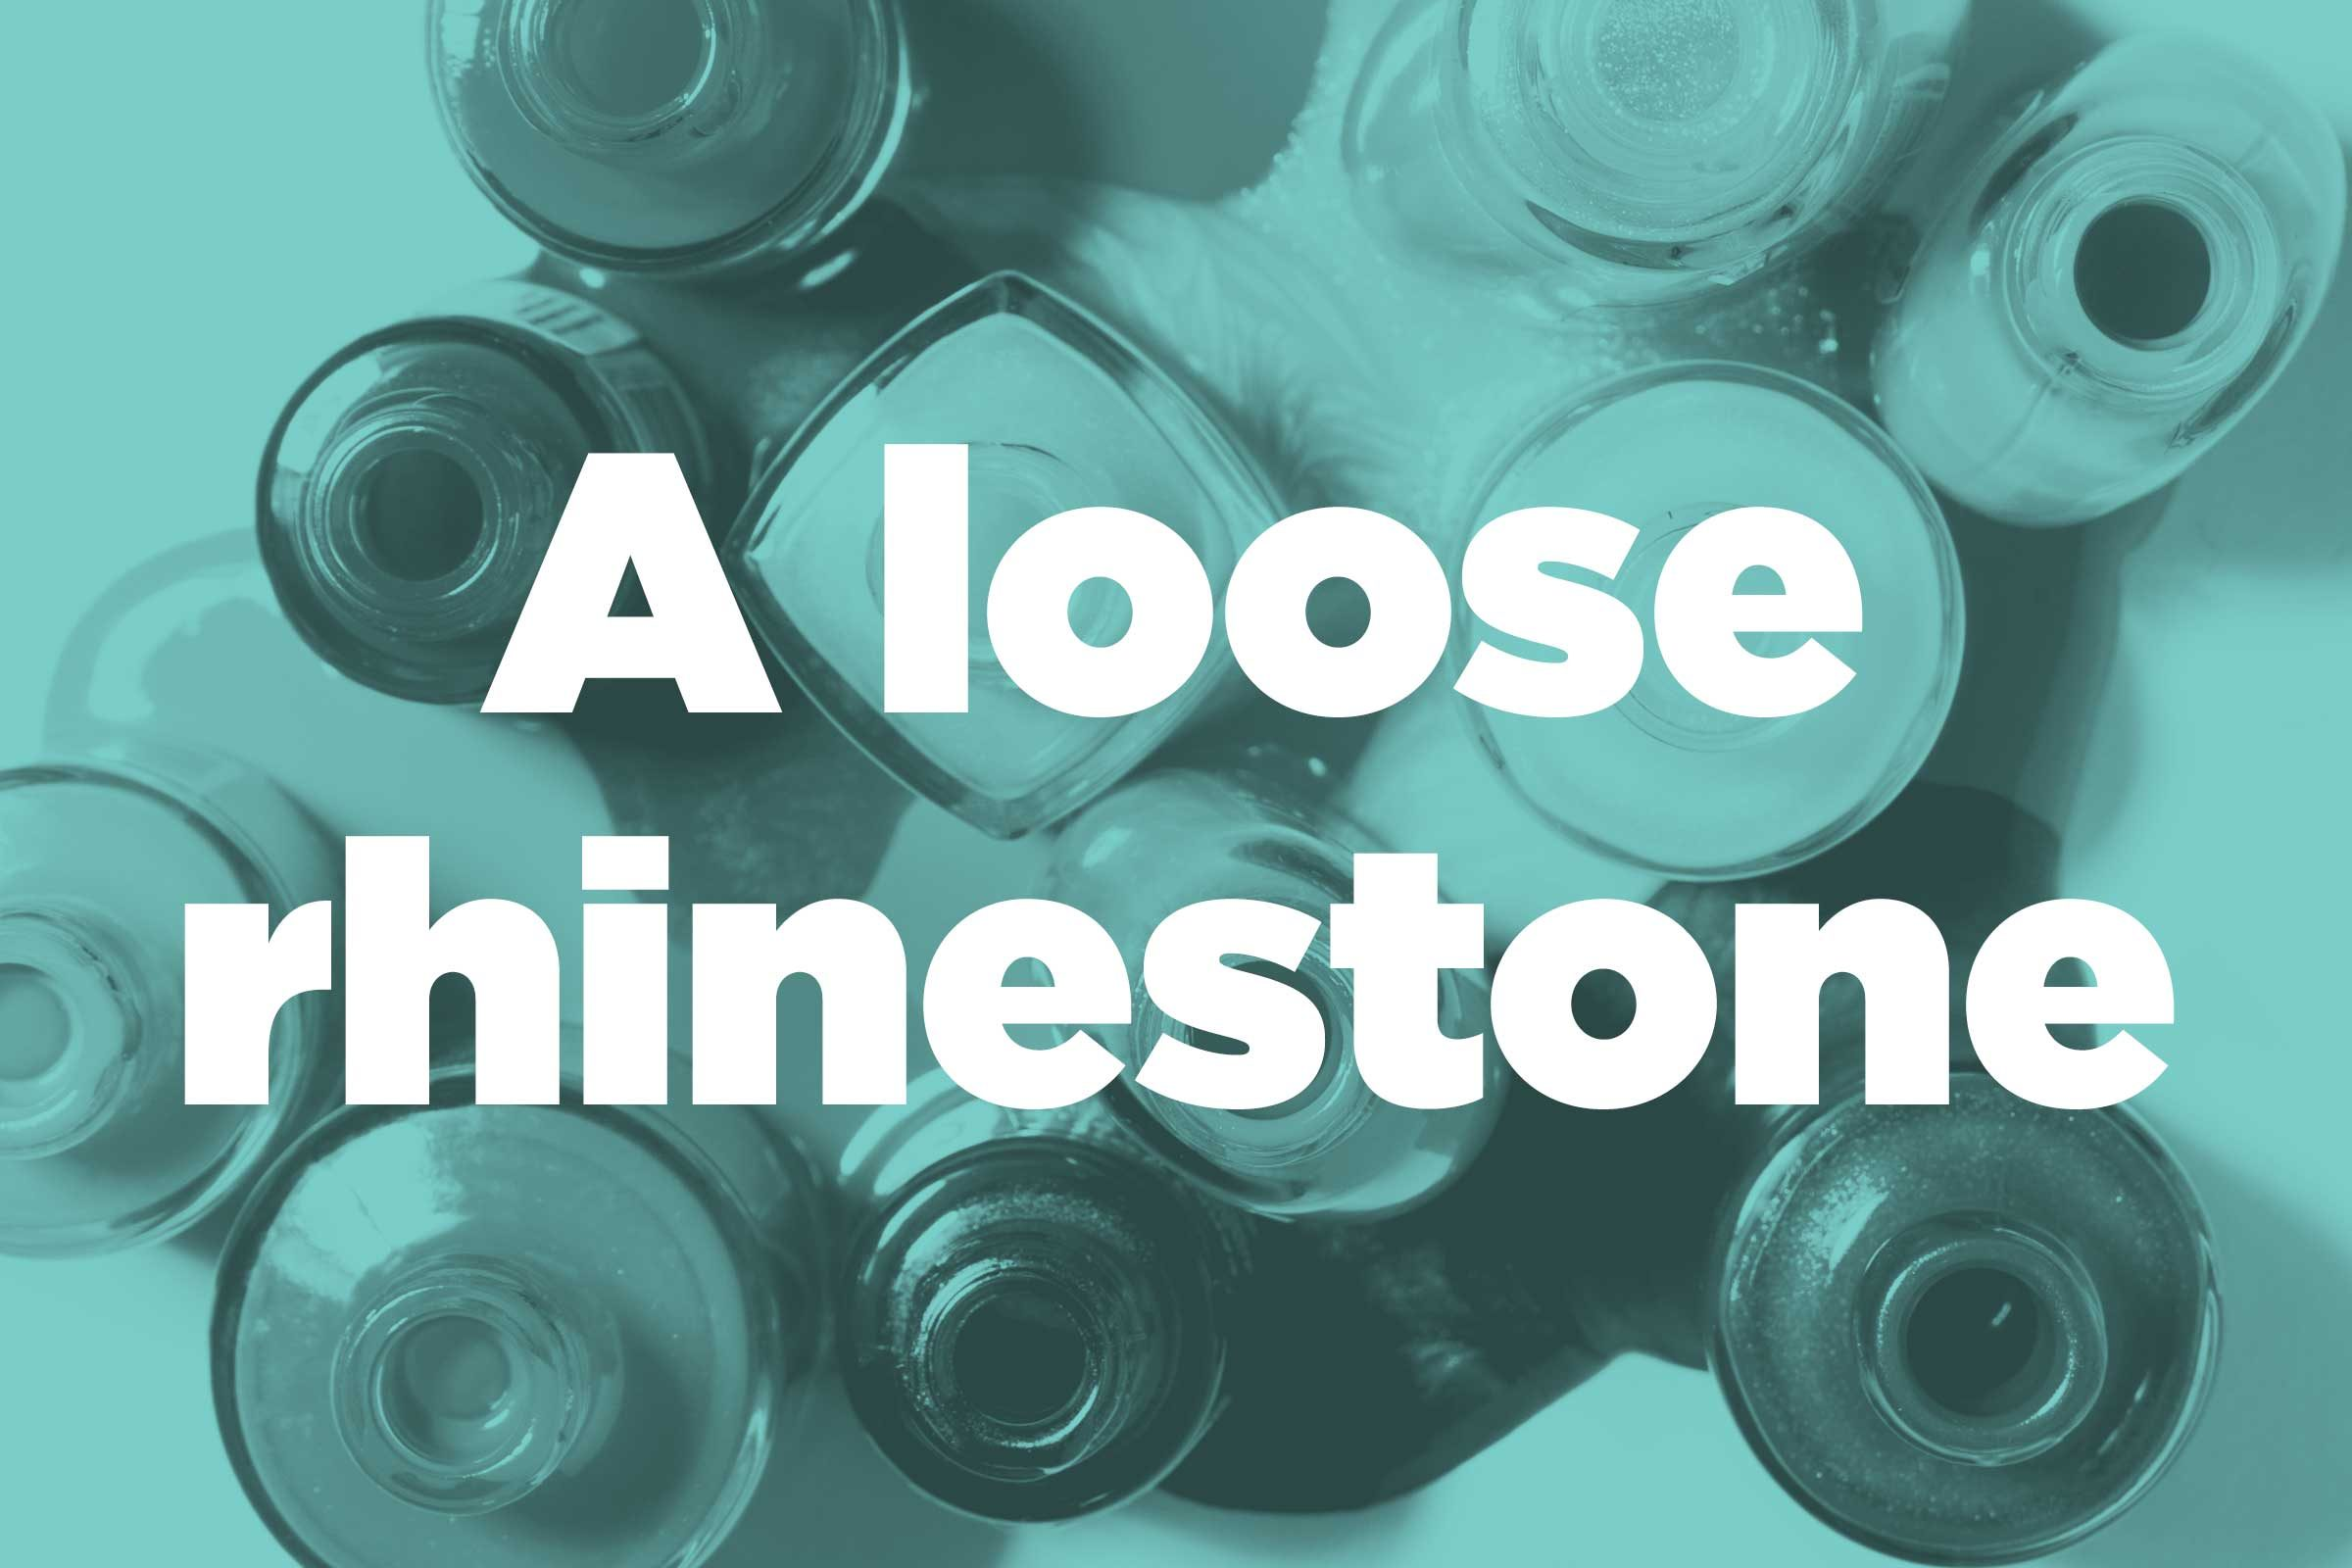 Reattach a loose rhinestone